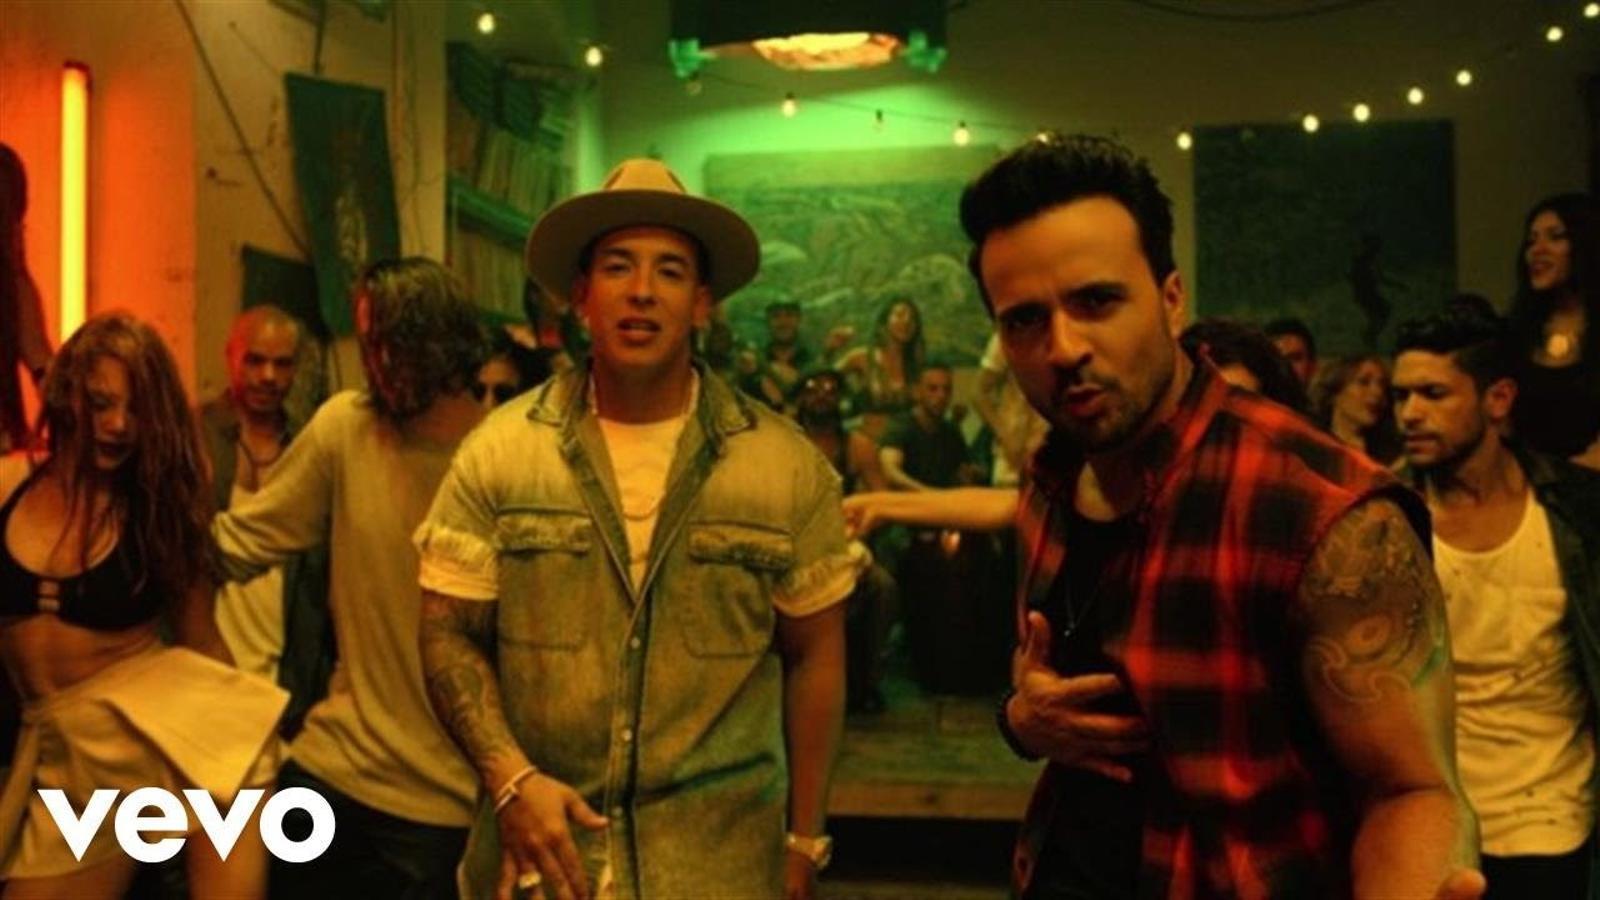 'Despacito', de Luis Fonsi i Daddy Yankee